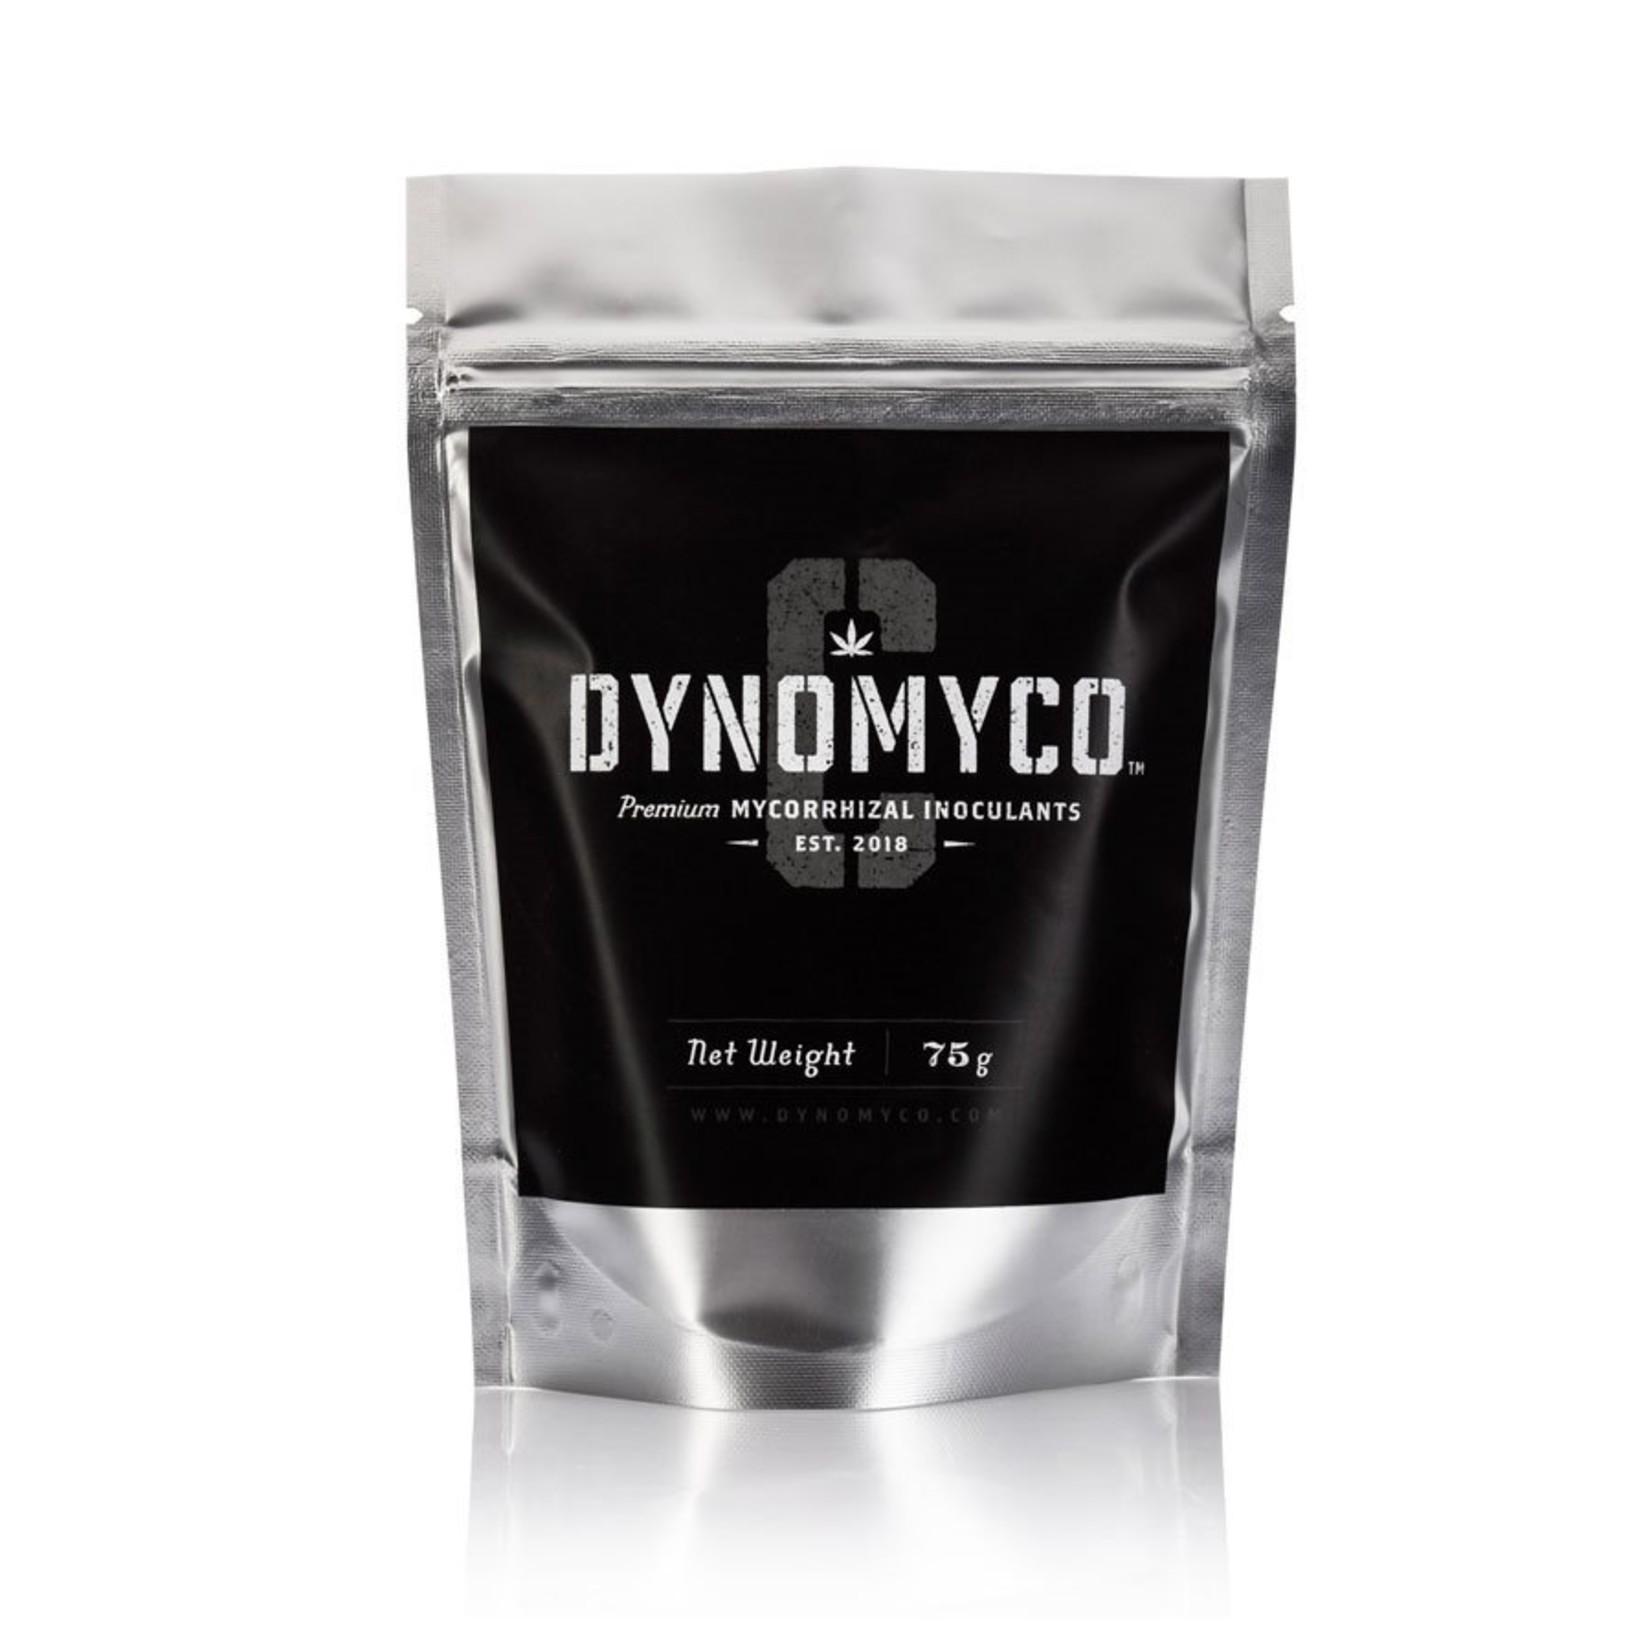 DYNOMYCO MYCORRHIZAL